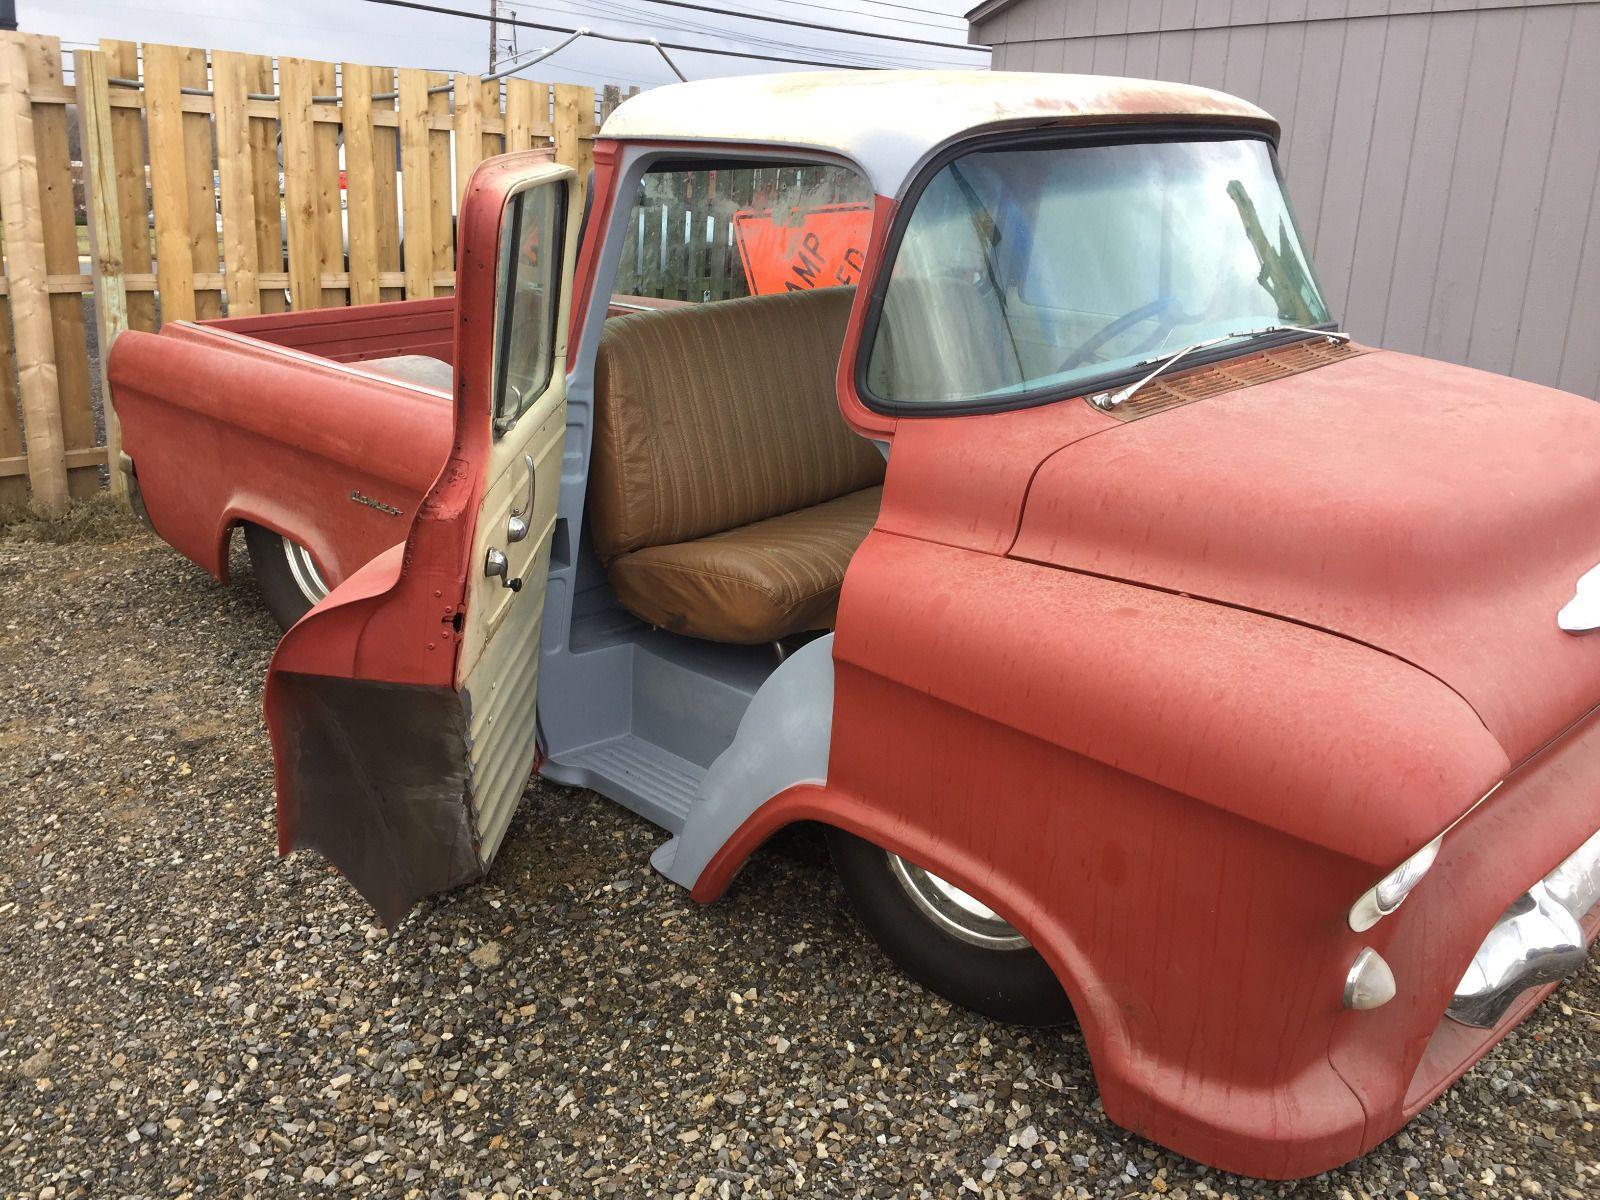 1956 Chevrolet Other Pickups Cameo In Ebay Motors Cars Amp Trucks Chevrolet Other Pickups Ebay Chevrolet Lowered Trucks Cool Trucks